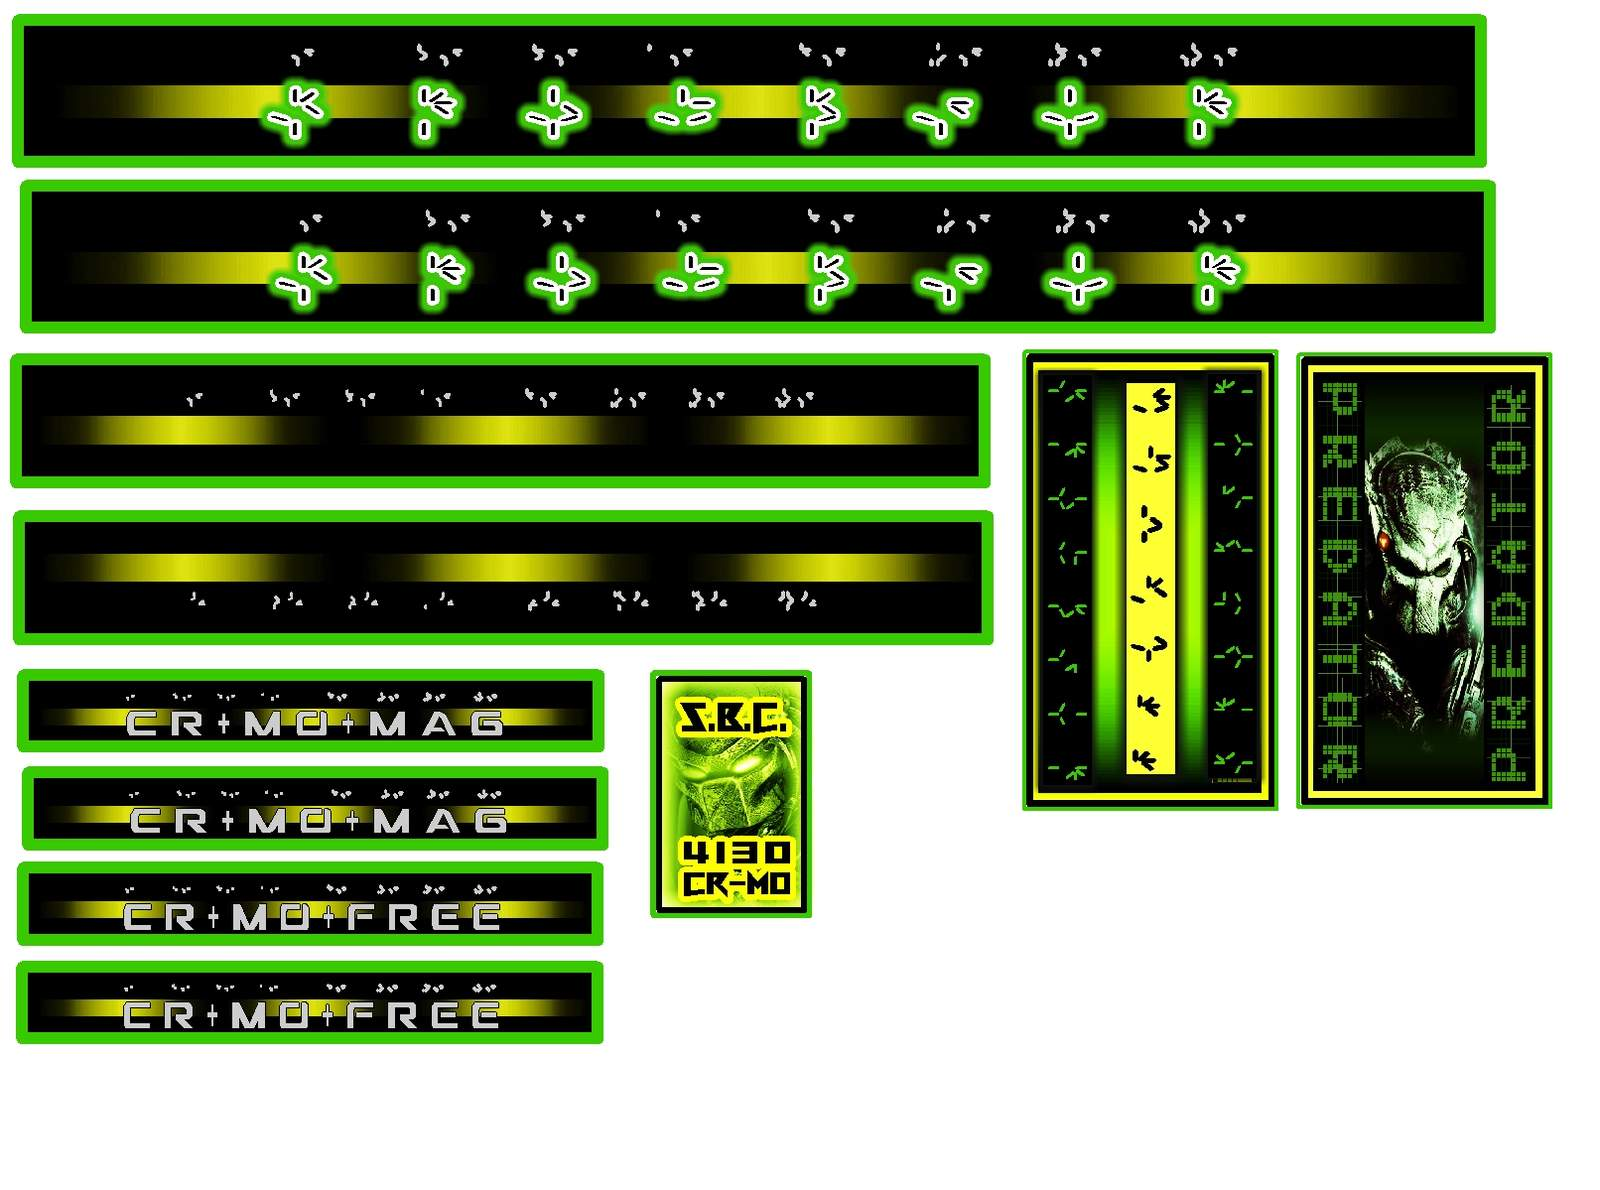 http://uploads.bmxmuseum.com/user-images/61851/digital-pred-full-decal-0015b3f644aca.jpg